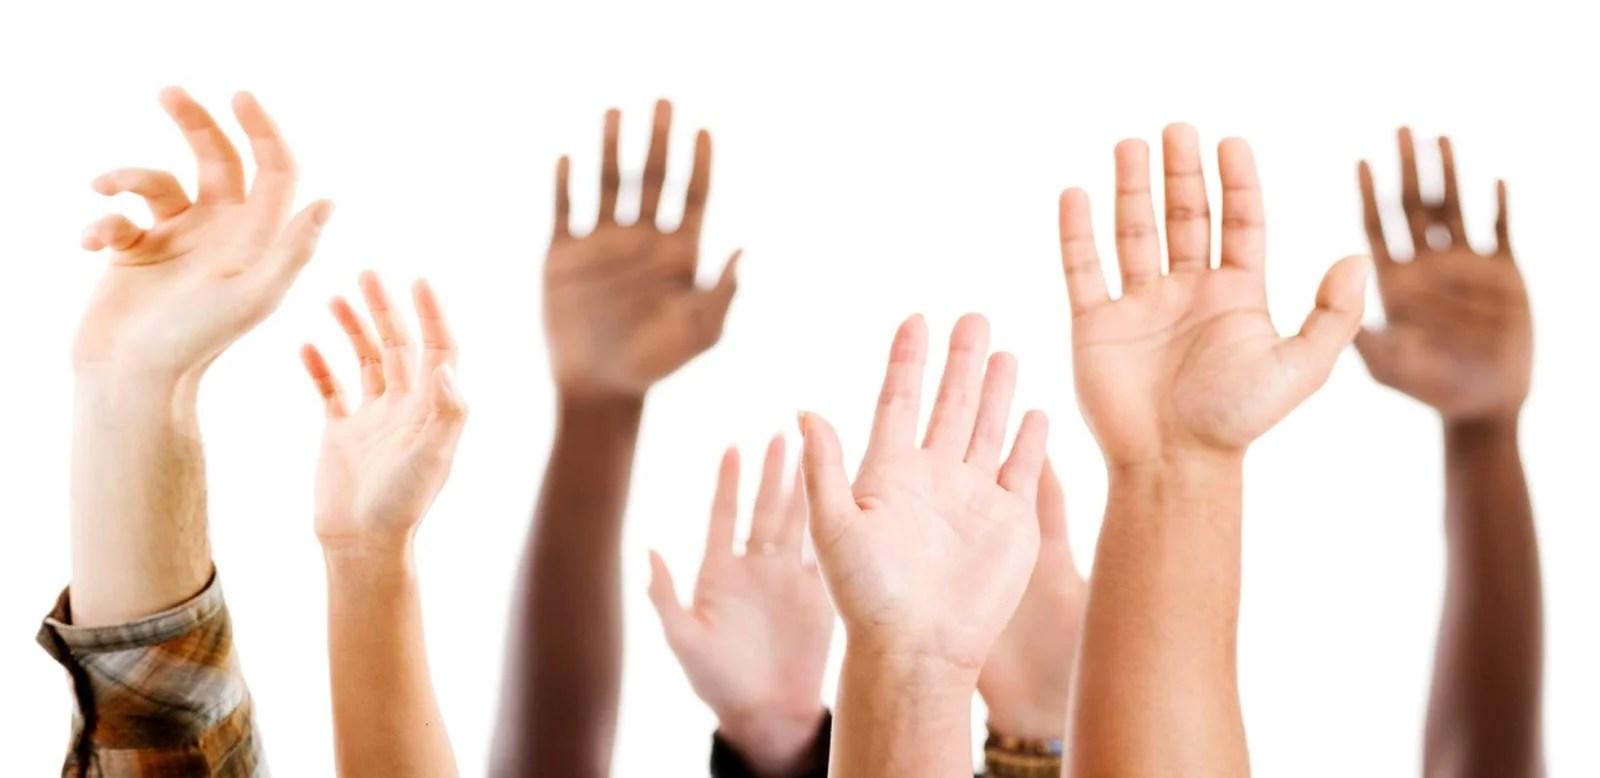 Simplifying The Science Teaching Hand Raising To Children